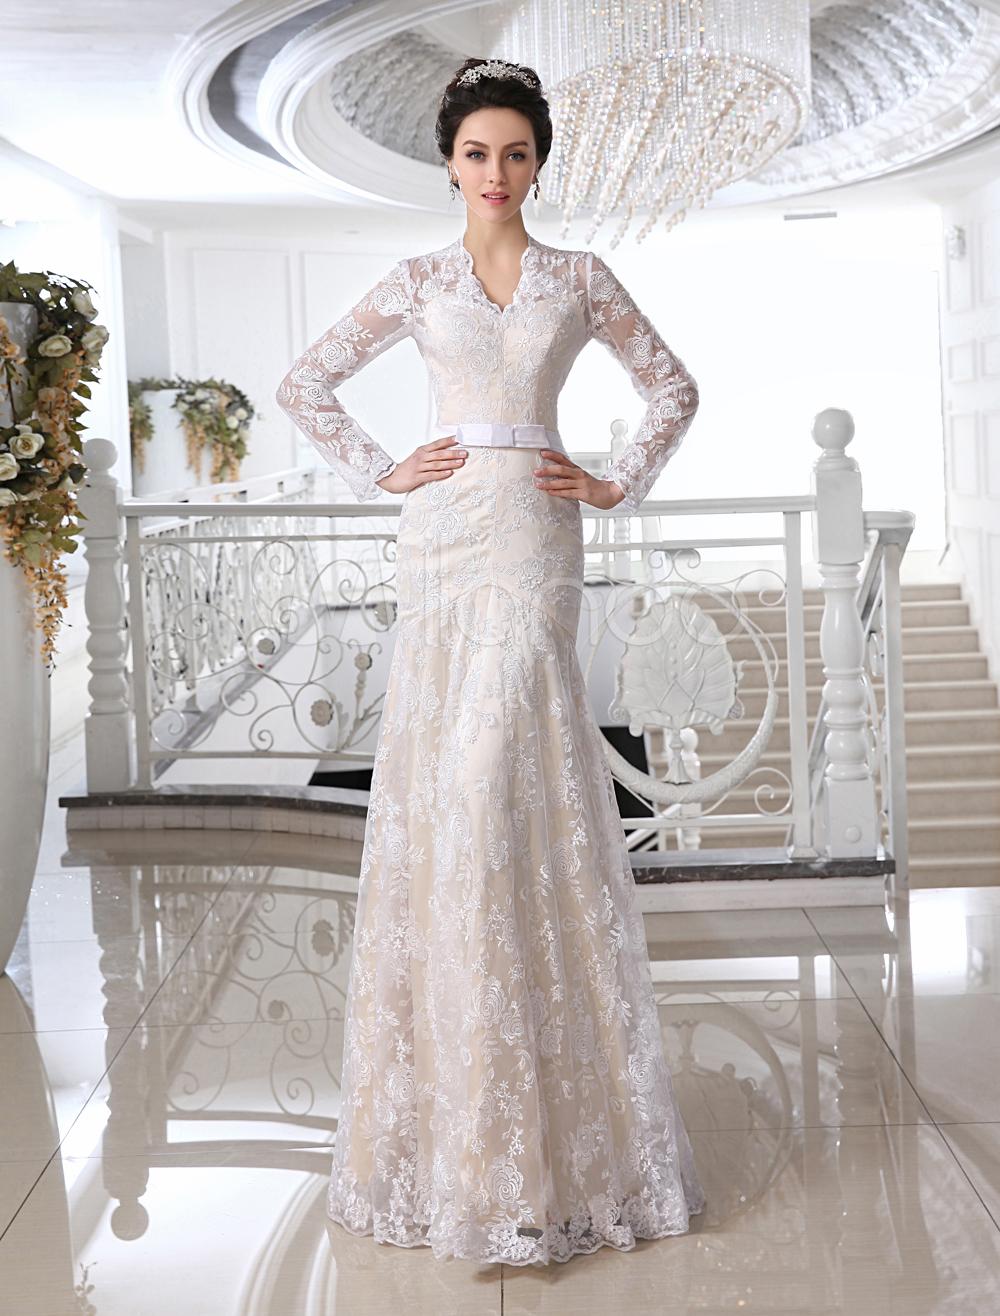 Wedding Dresses Lace Champagne Bridal Dress V Neck Long Sleeve Illusion Sheath Bow Sash Floor Length Wedding Gown (Cheap Wedding Dress) photo